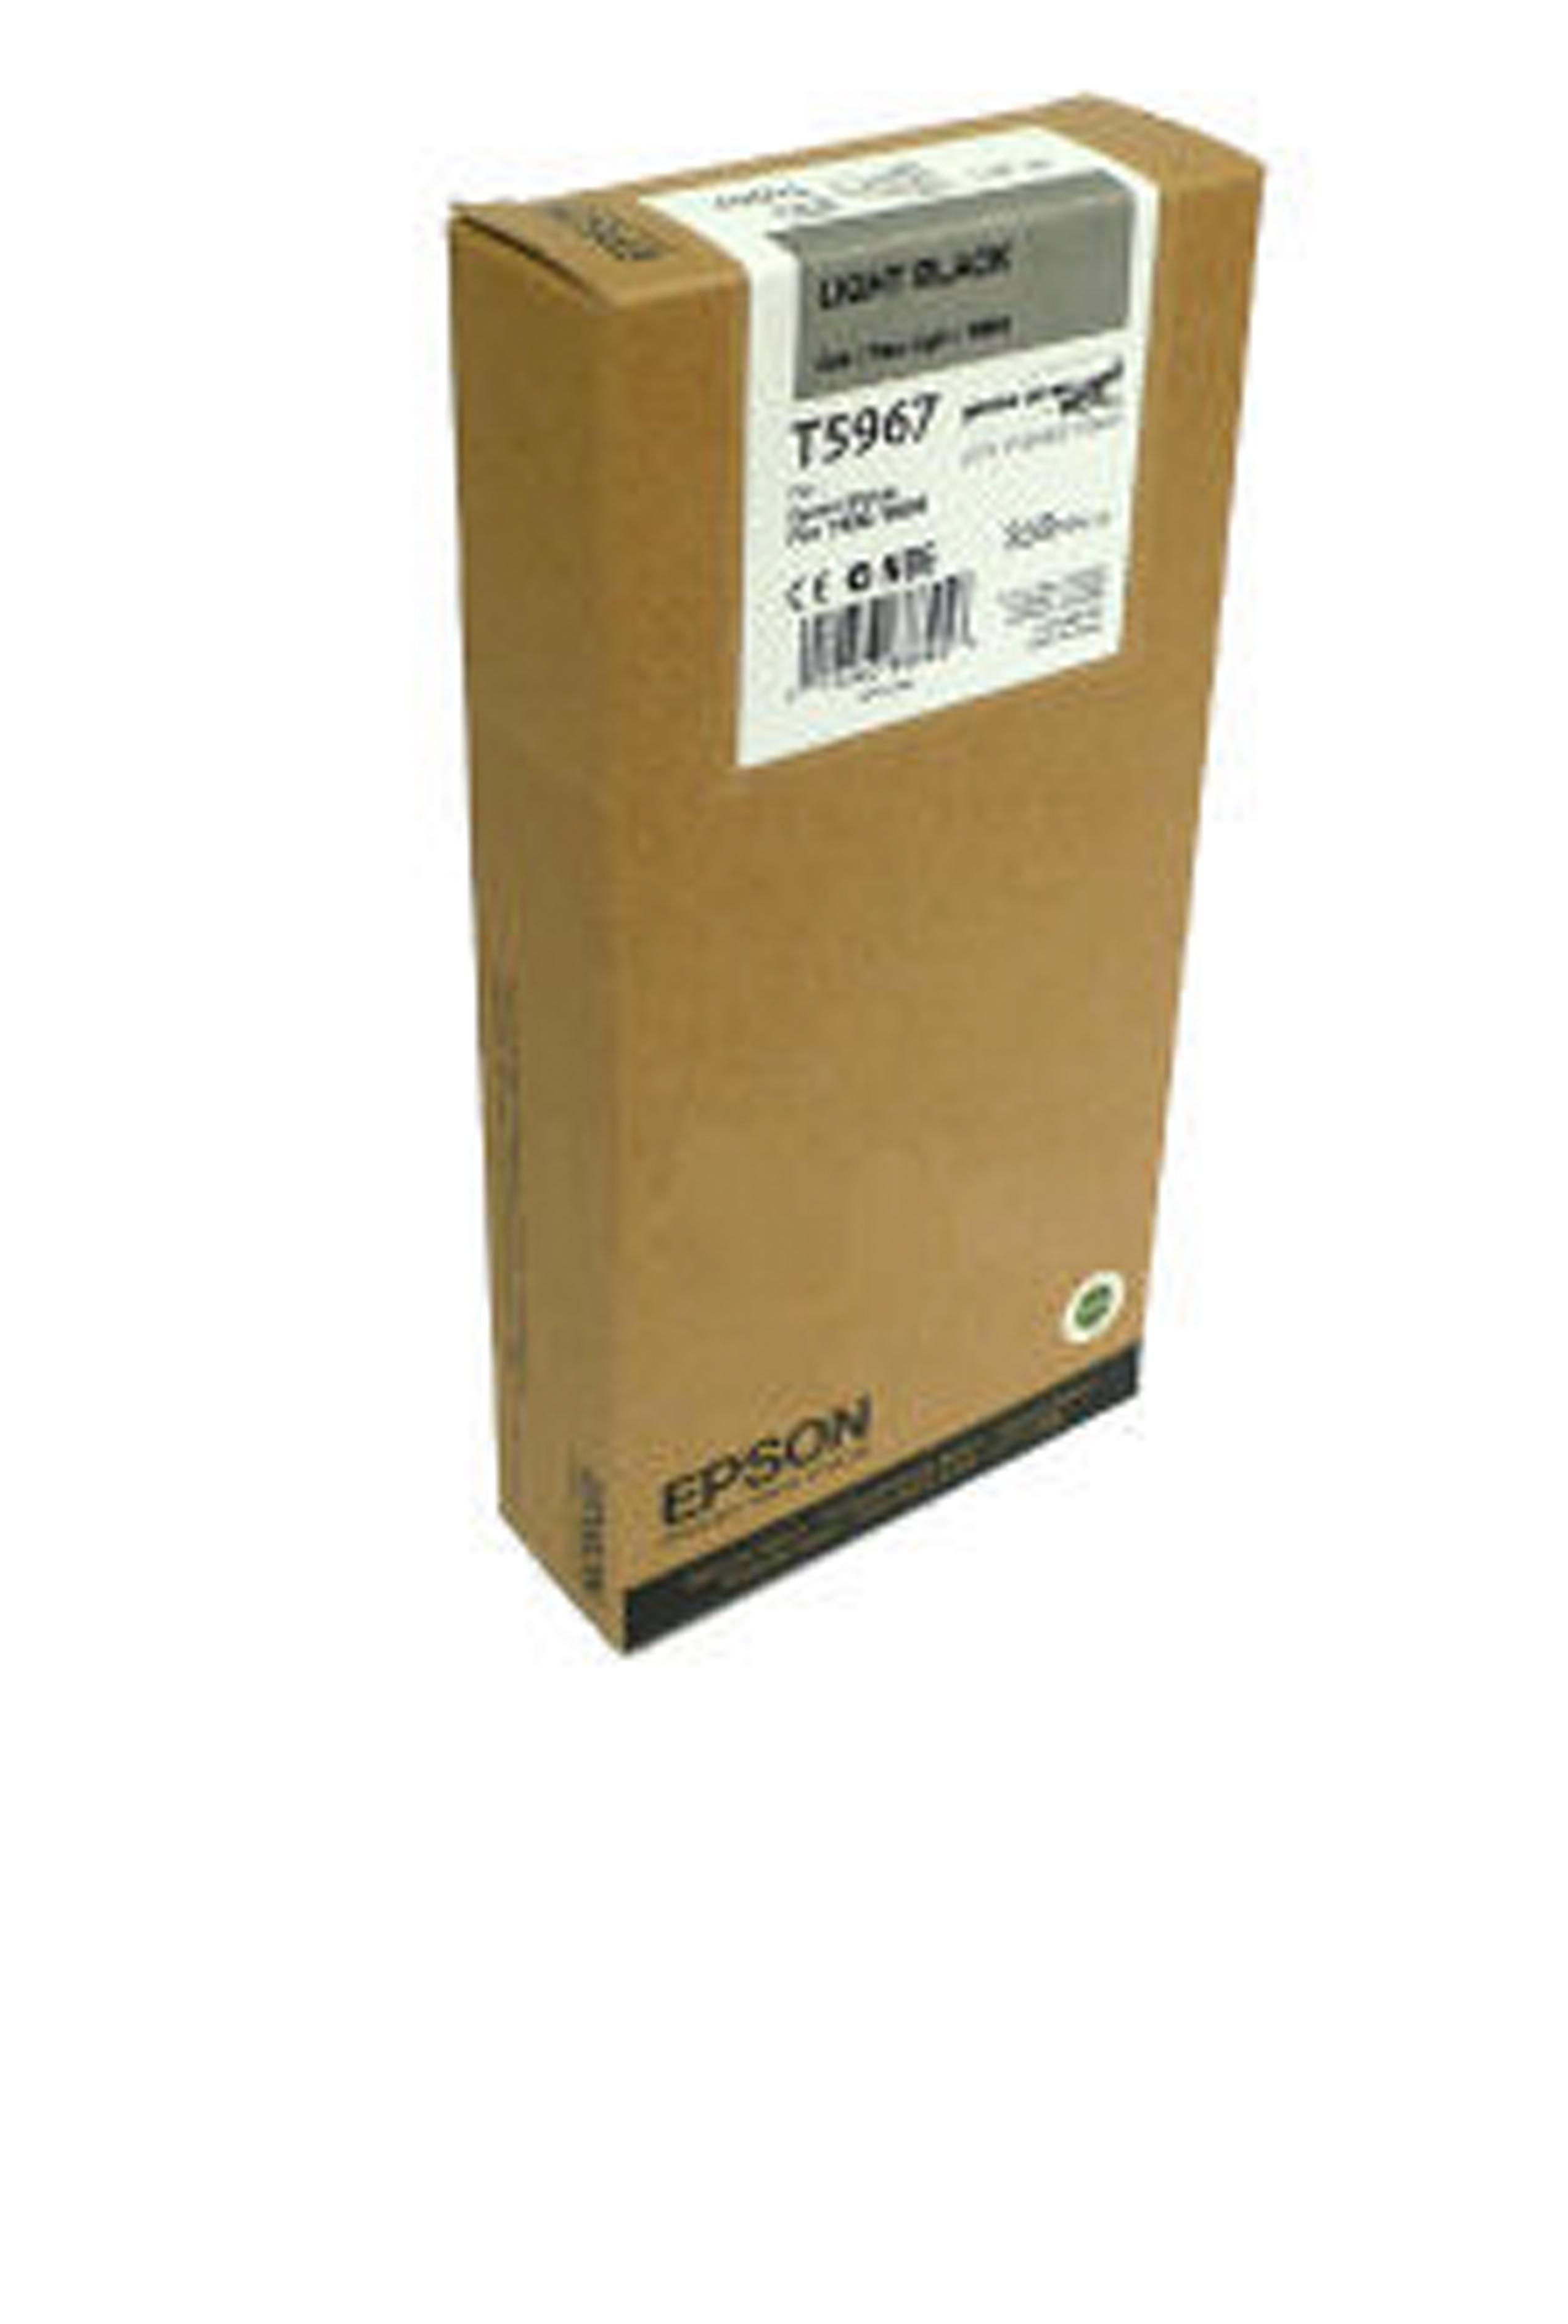 Epson EPSON SD LT BLACK INK (350 ML) (T596700)